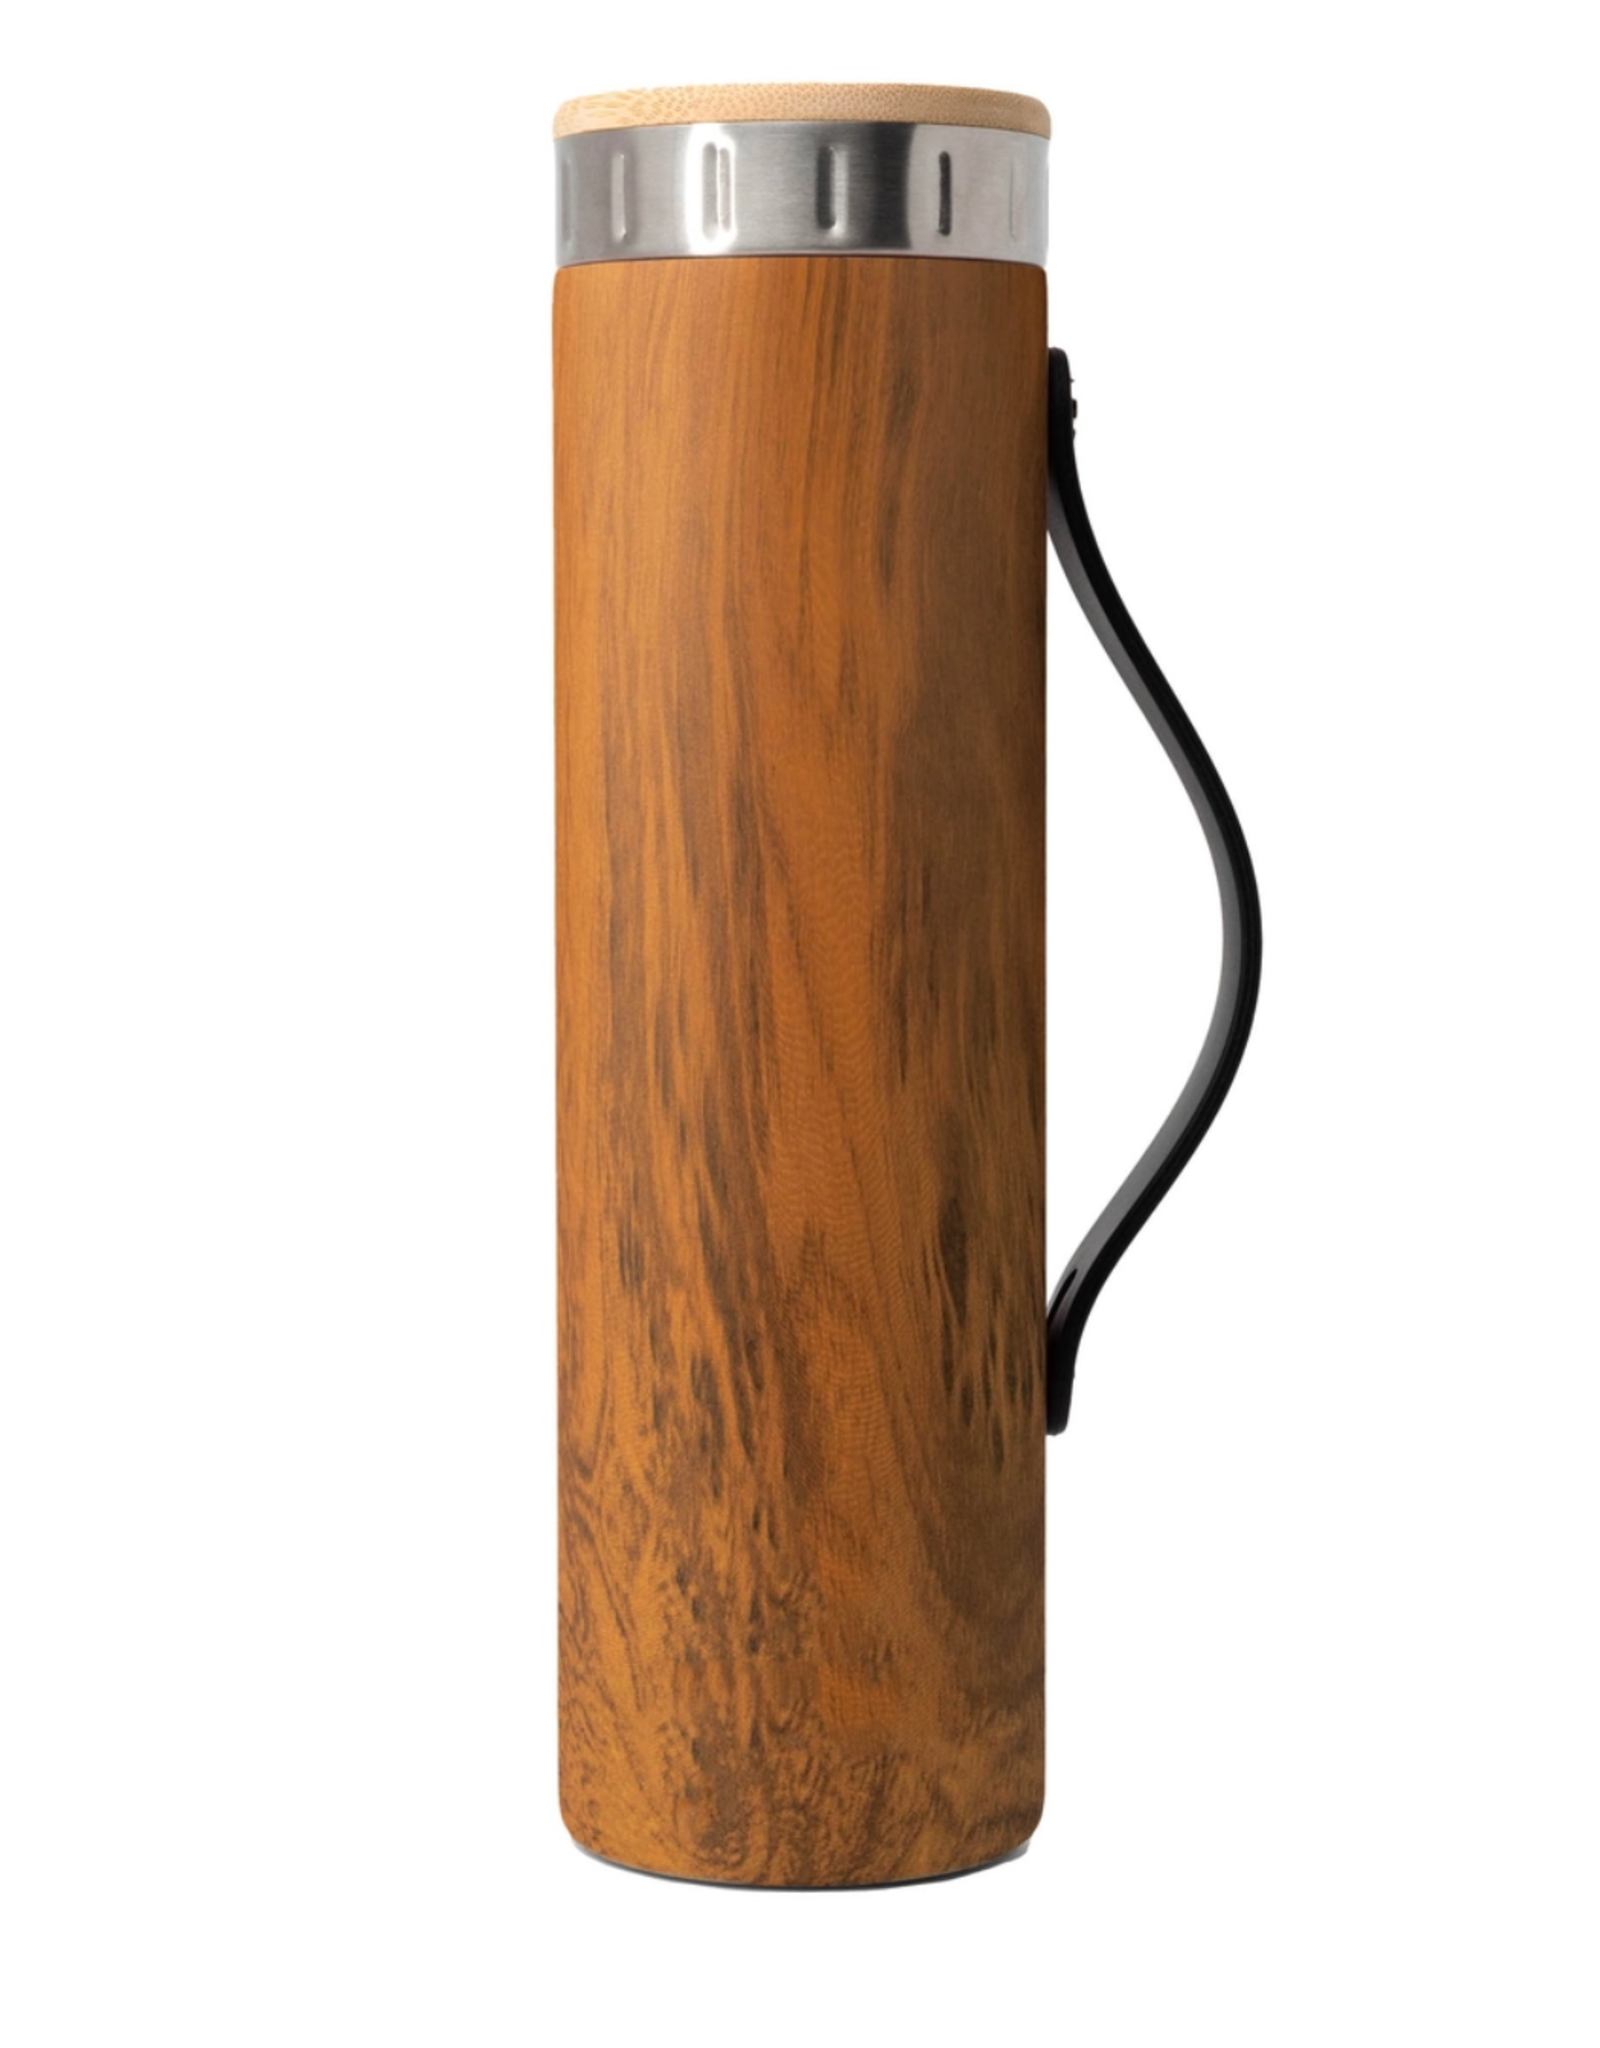 Teak Wood Water Bottle with Strap - 20 oz